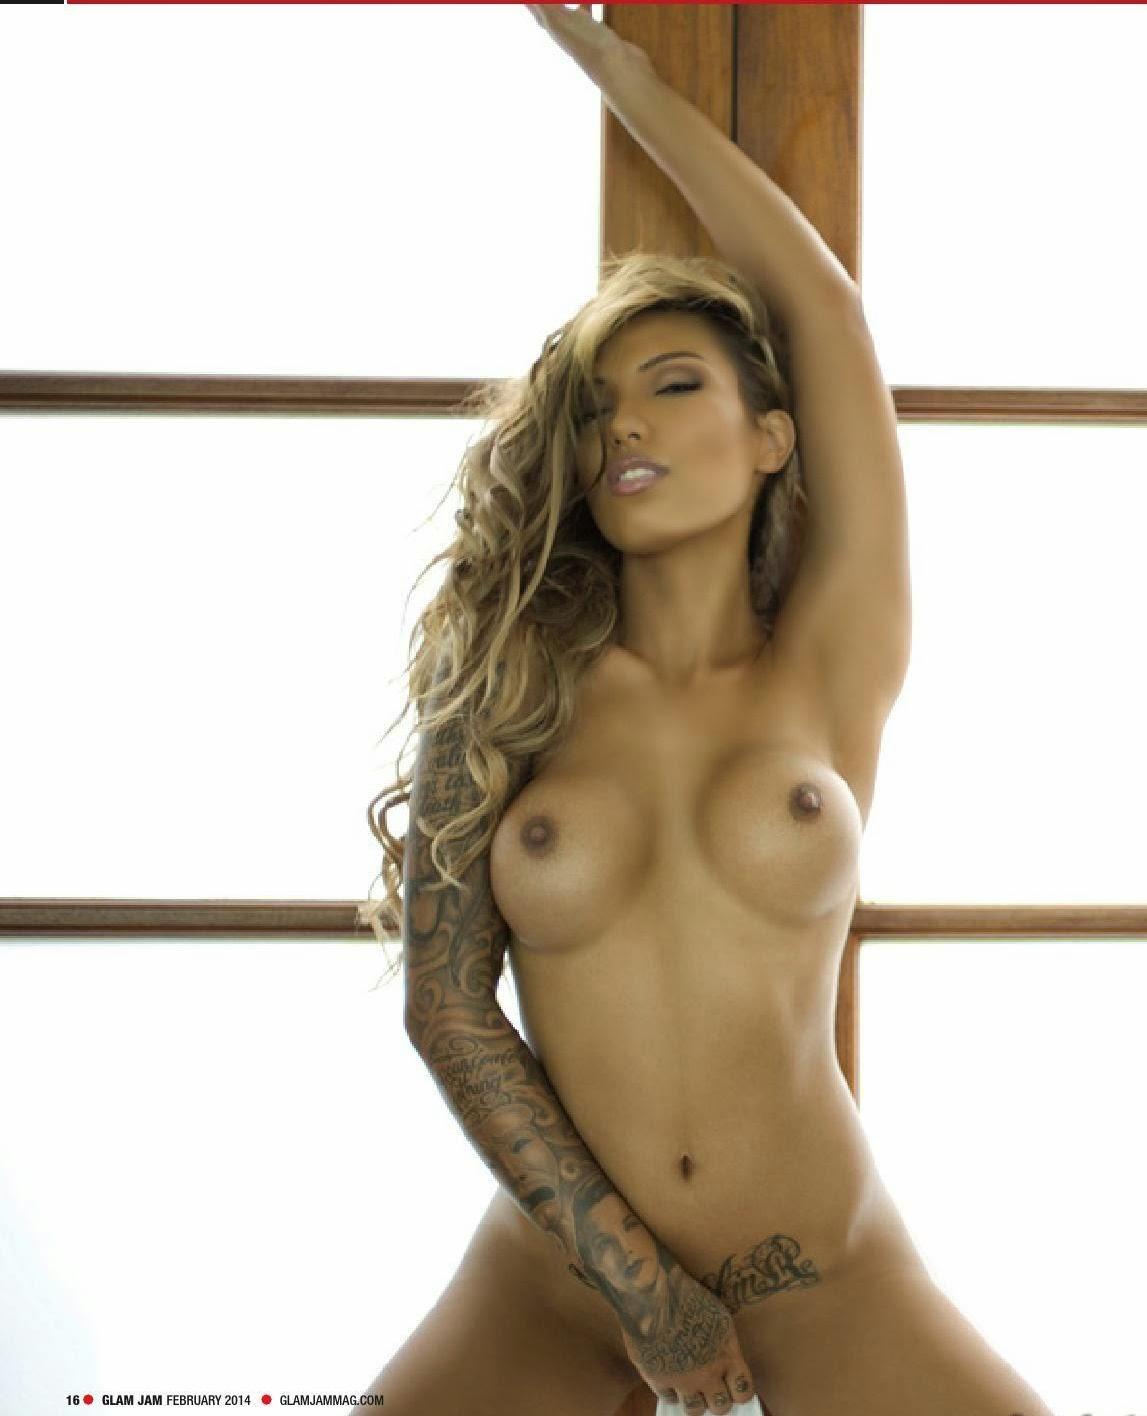 Leah van dale topless